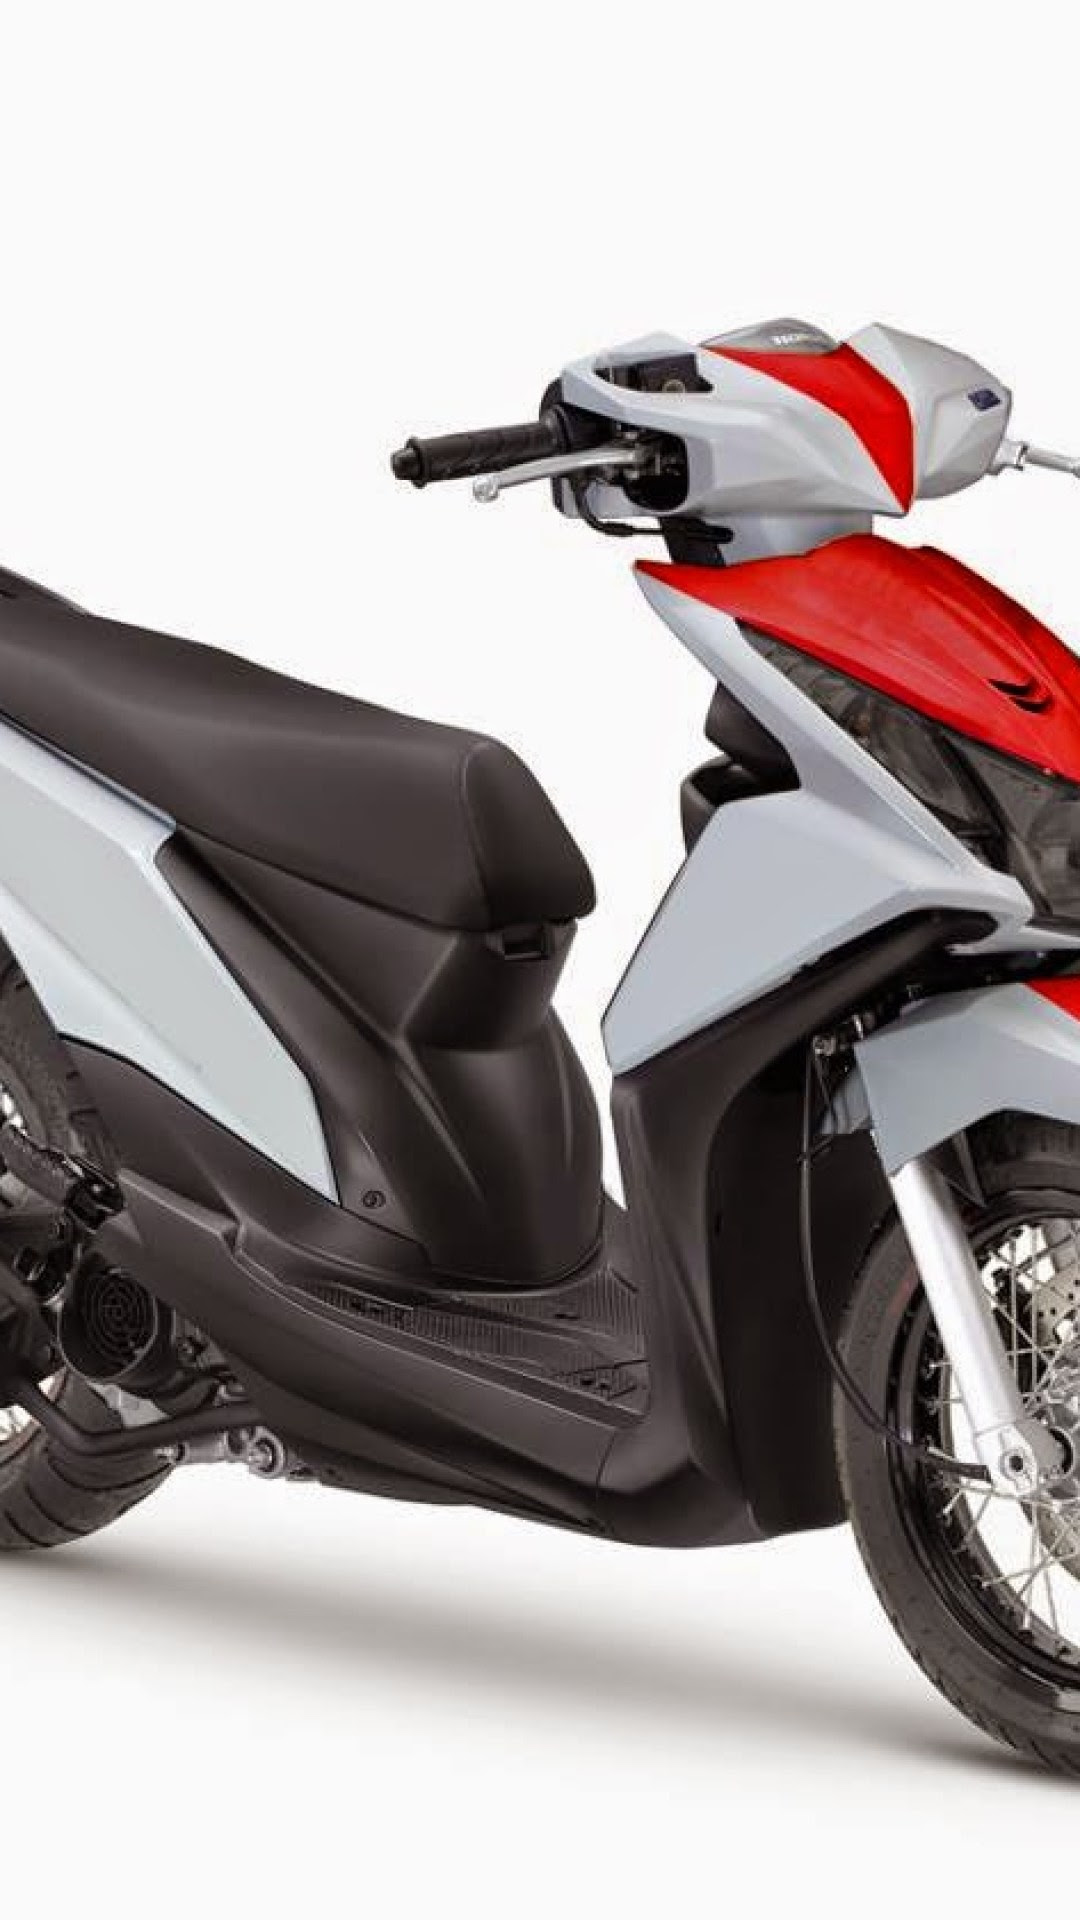 94 Modifikasi Motor Beat Fi Repsol Terlengkap Gendoel Motoer